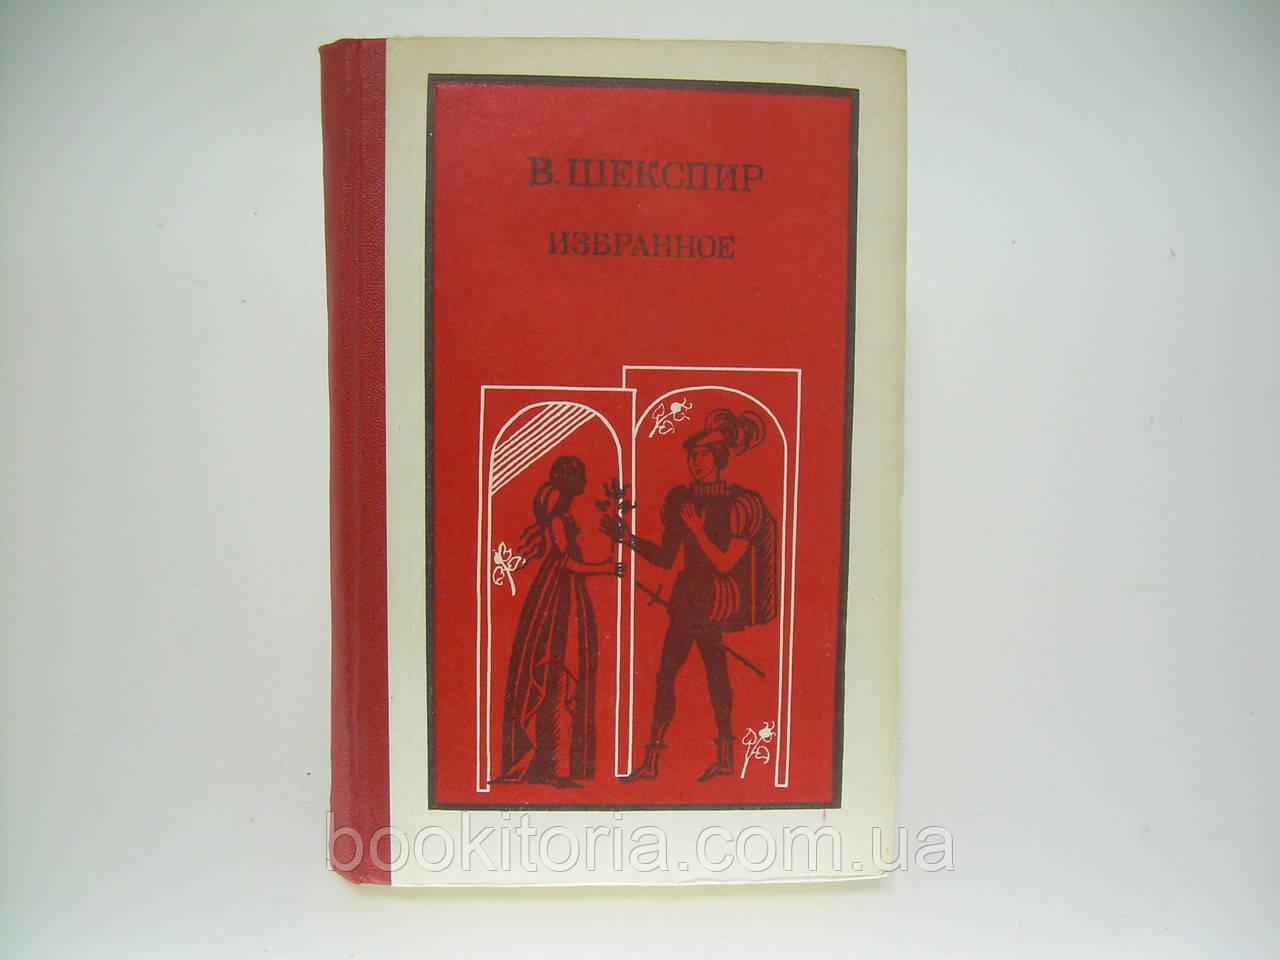 Шекспир В. Избранное (б/у).